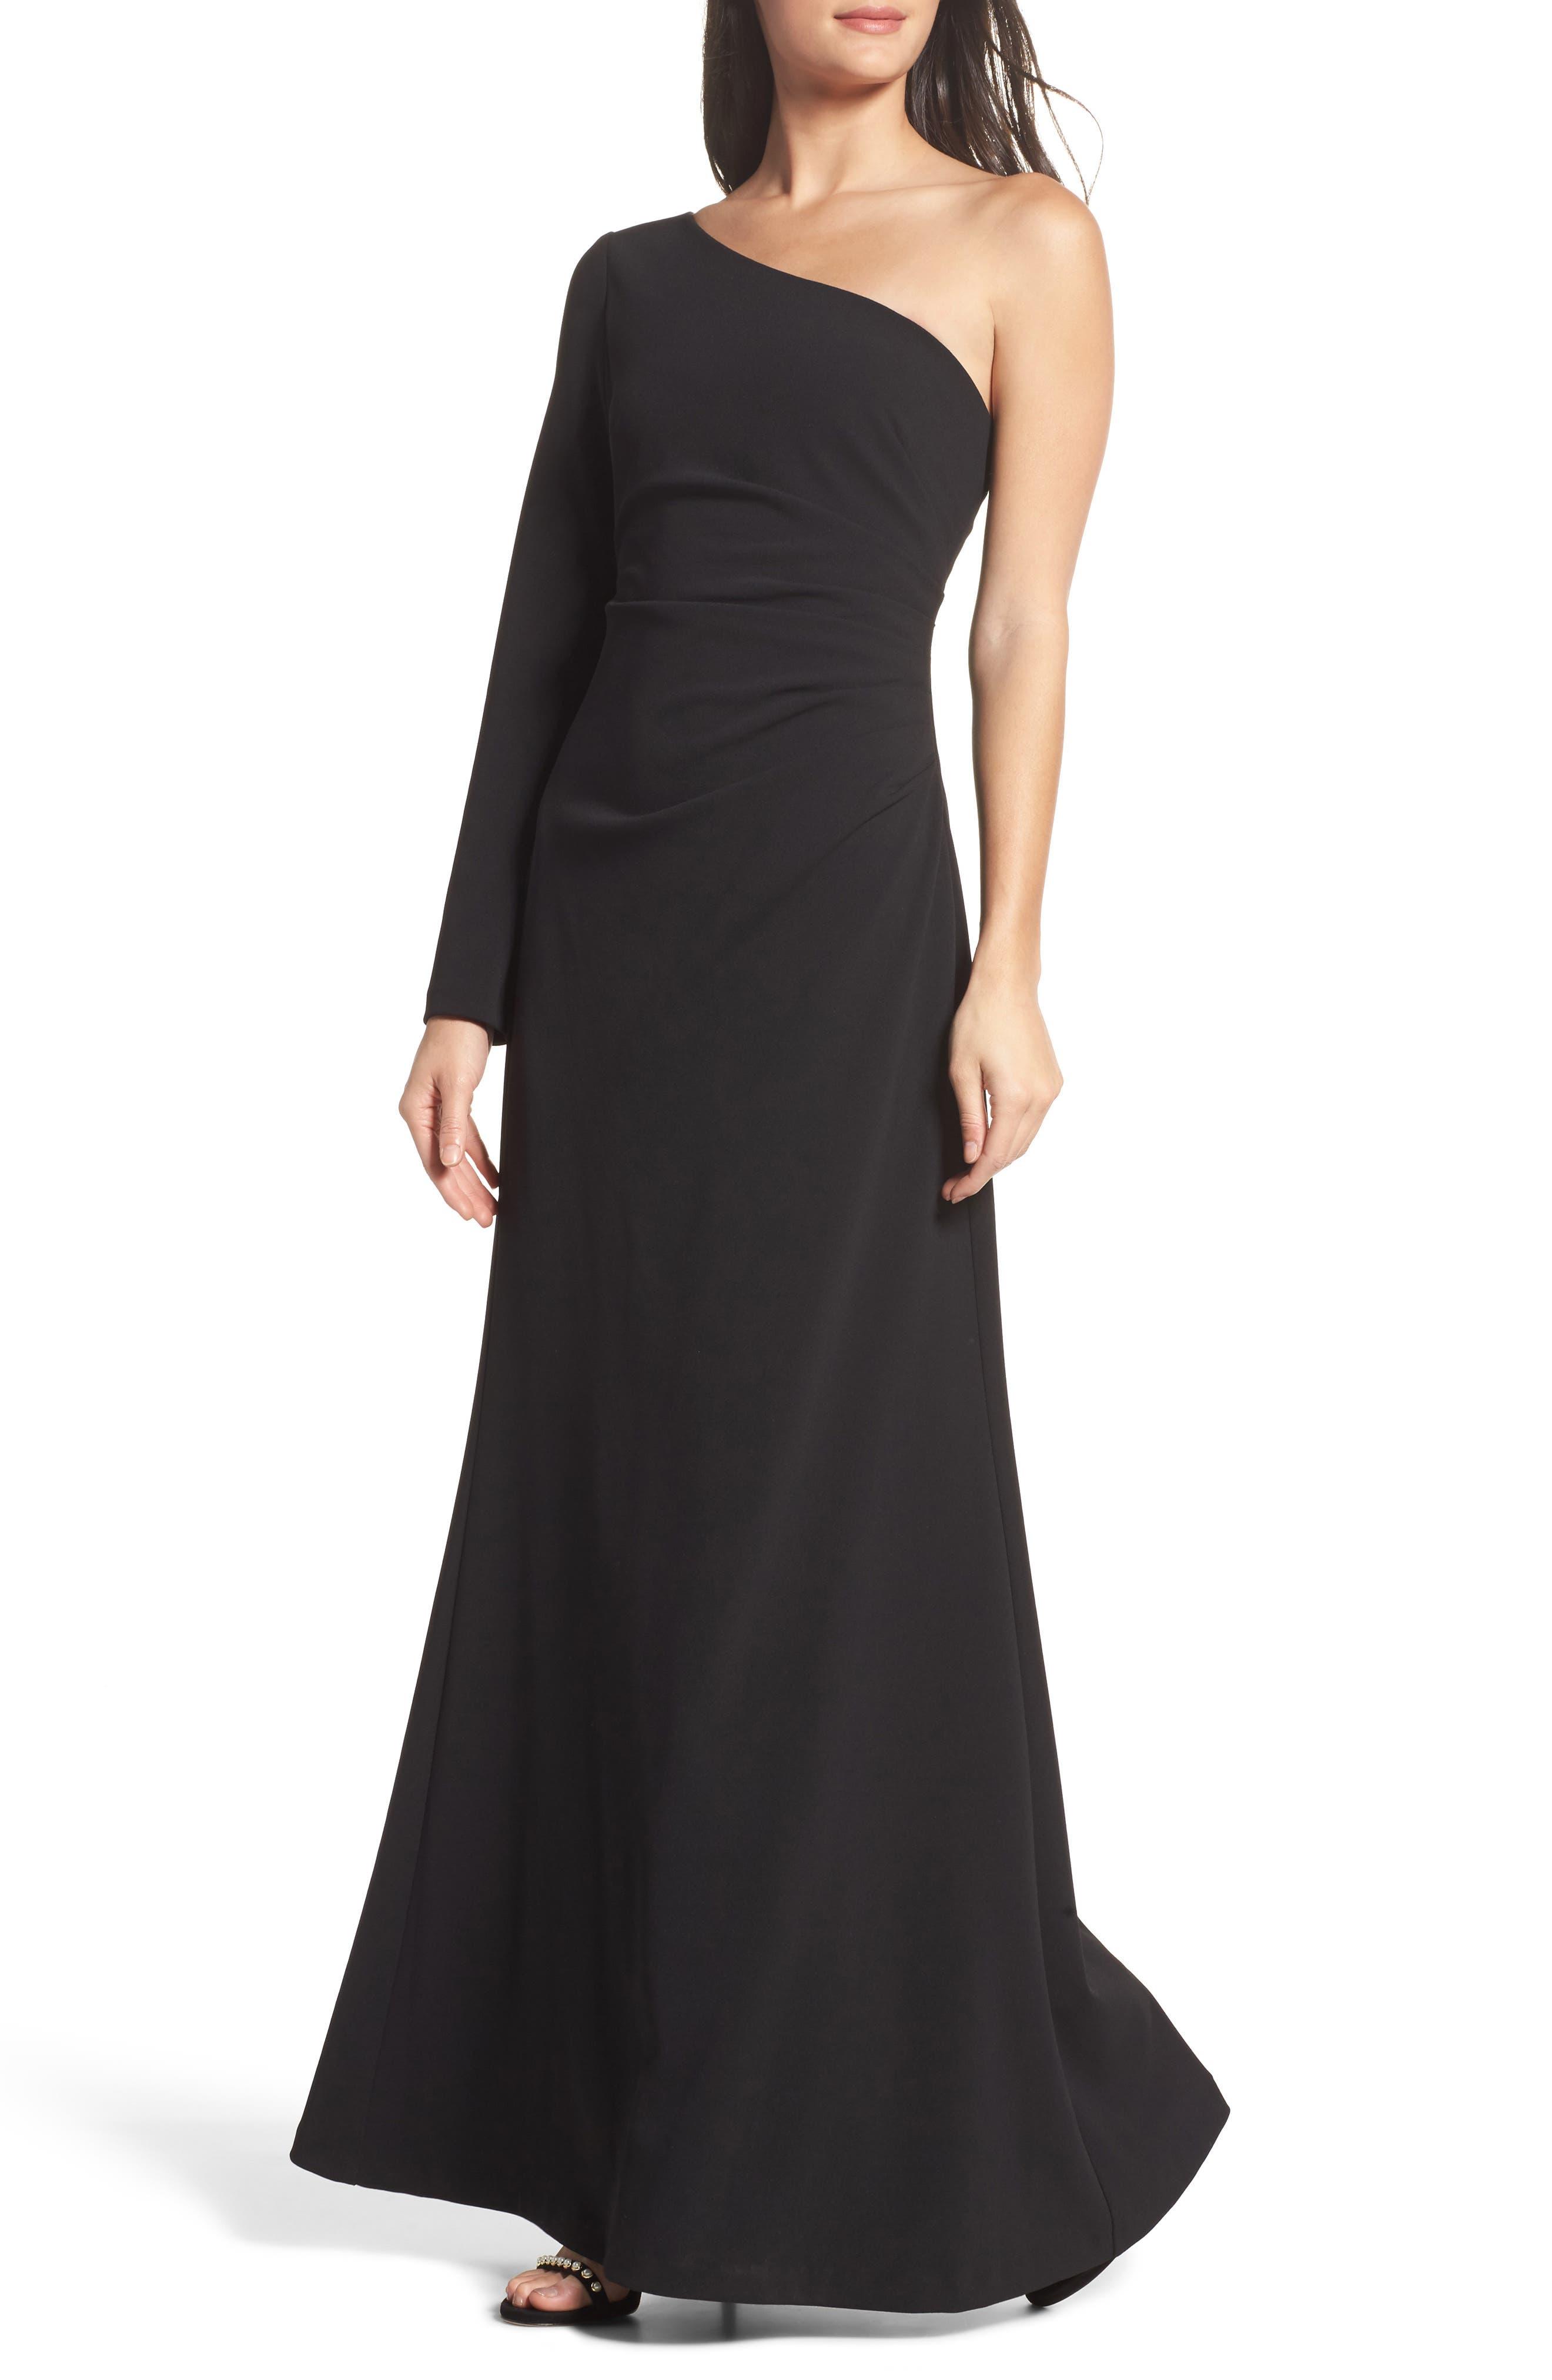 Nordstrom dresses for women images